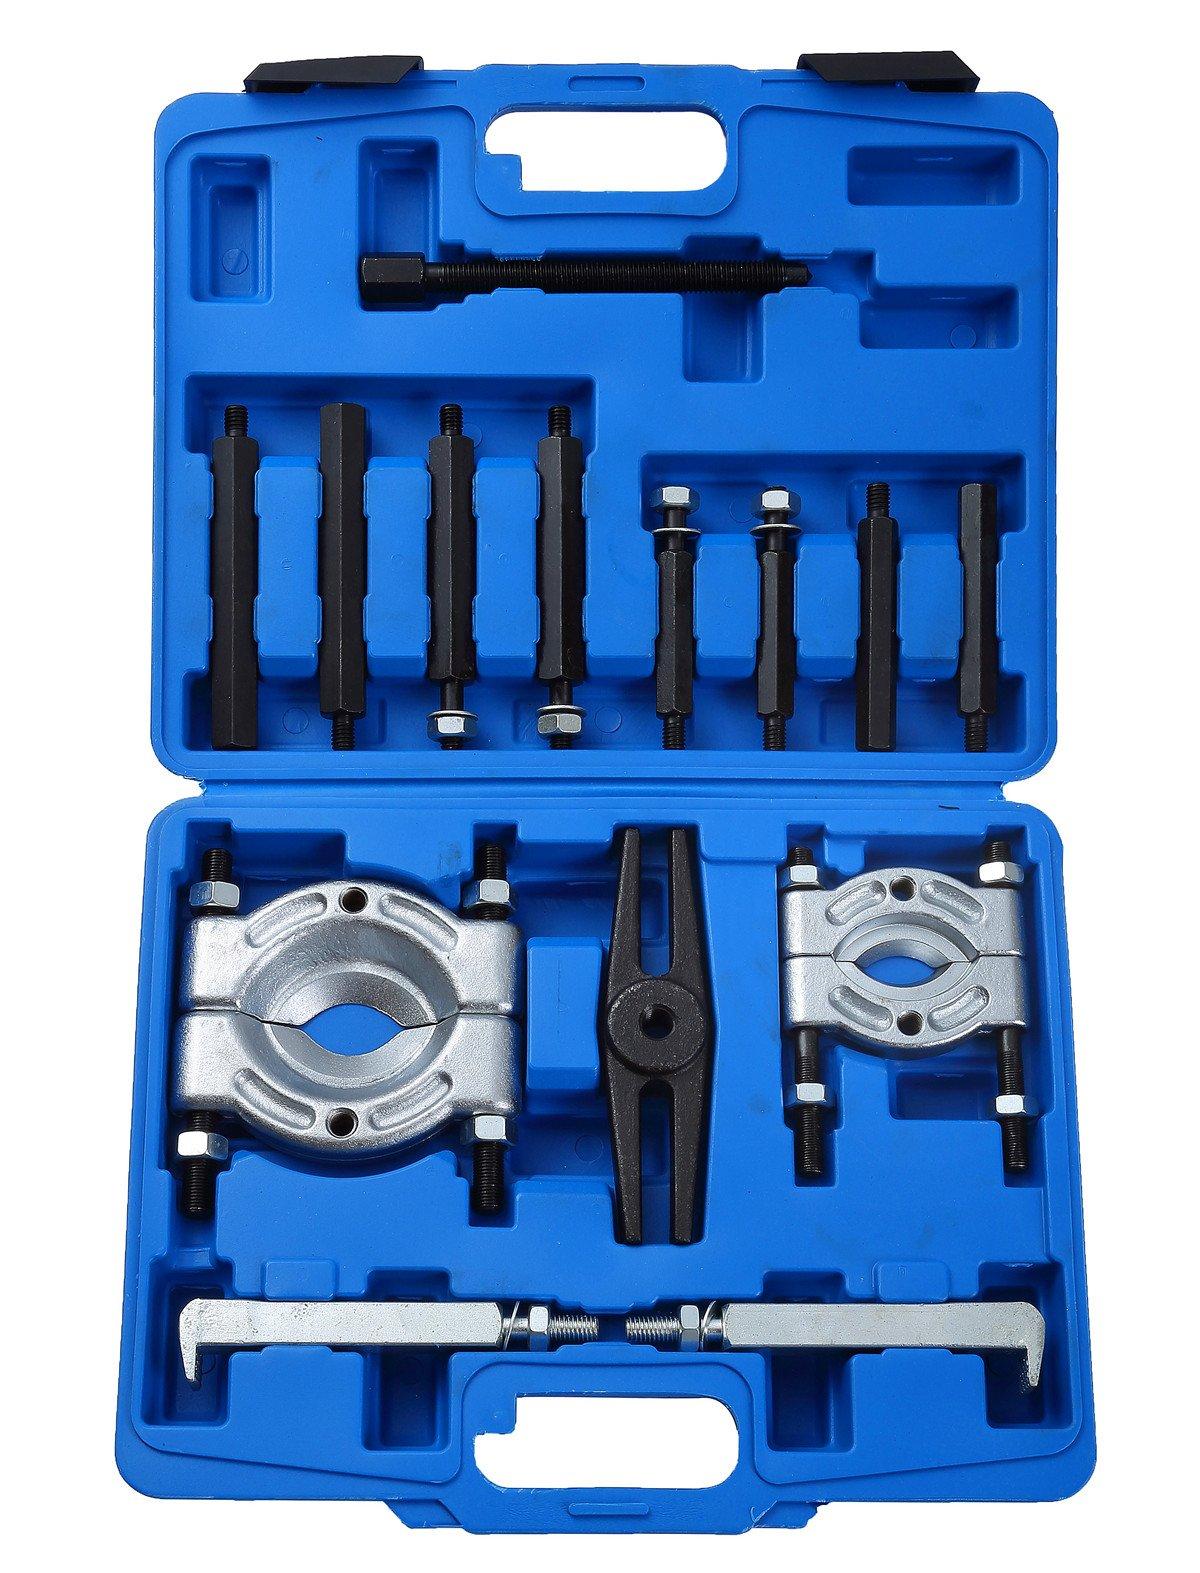 DASBET 14PCS Bearing Separator Puller Set 2'' and 3'' Splitters Remove Bearings Kit, Heavy Duty